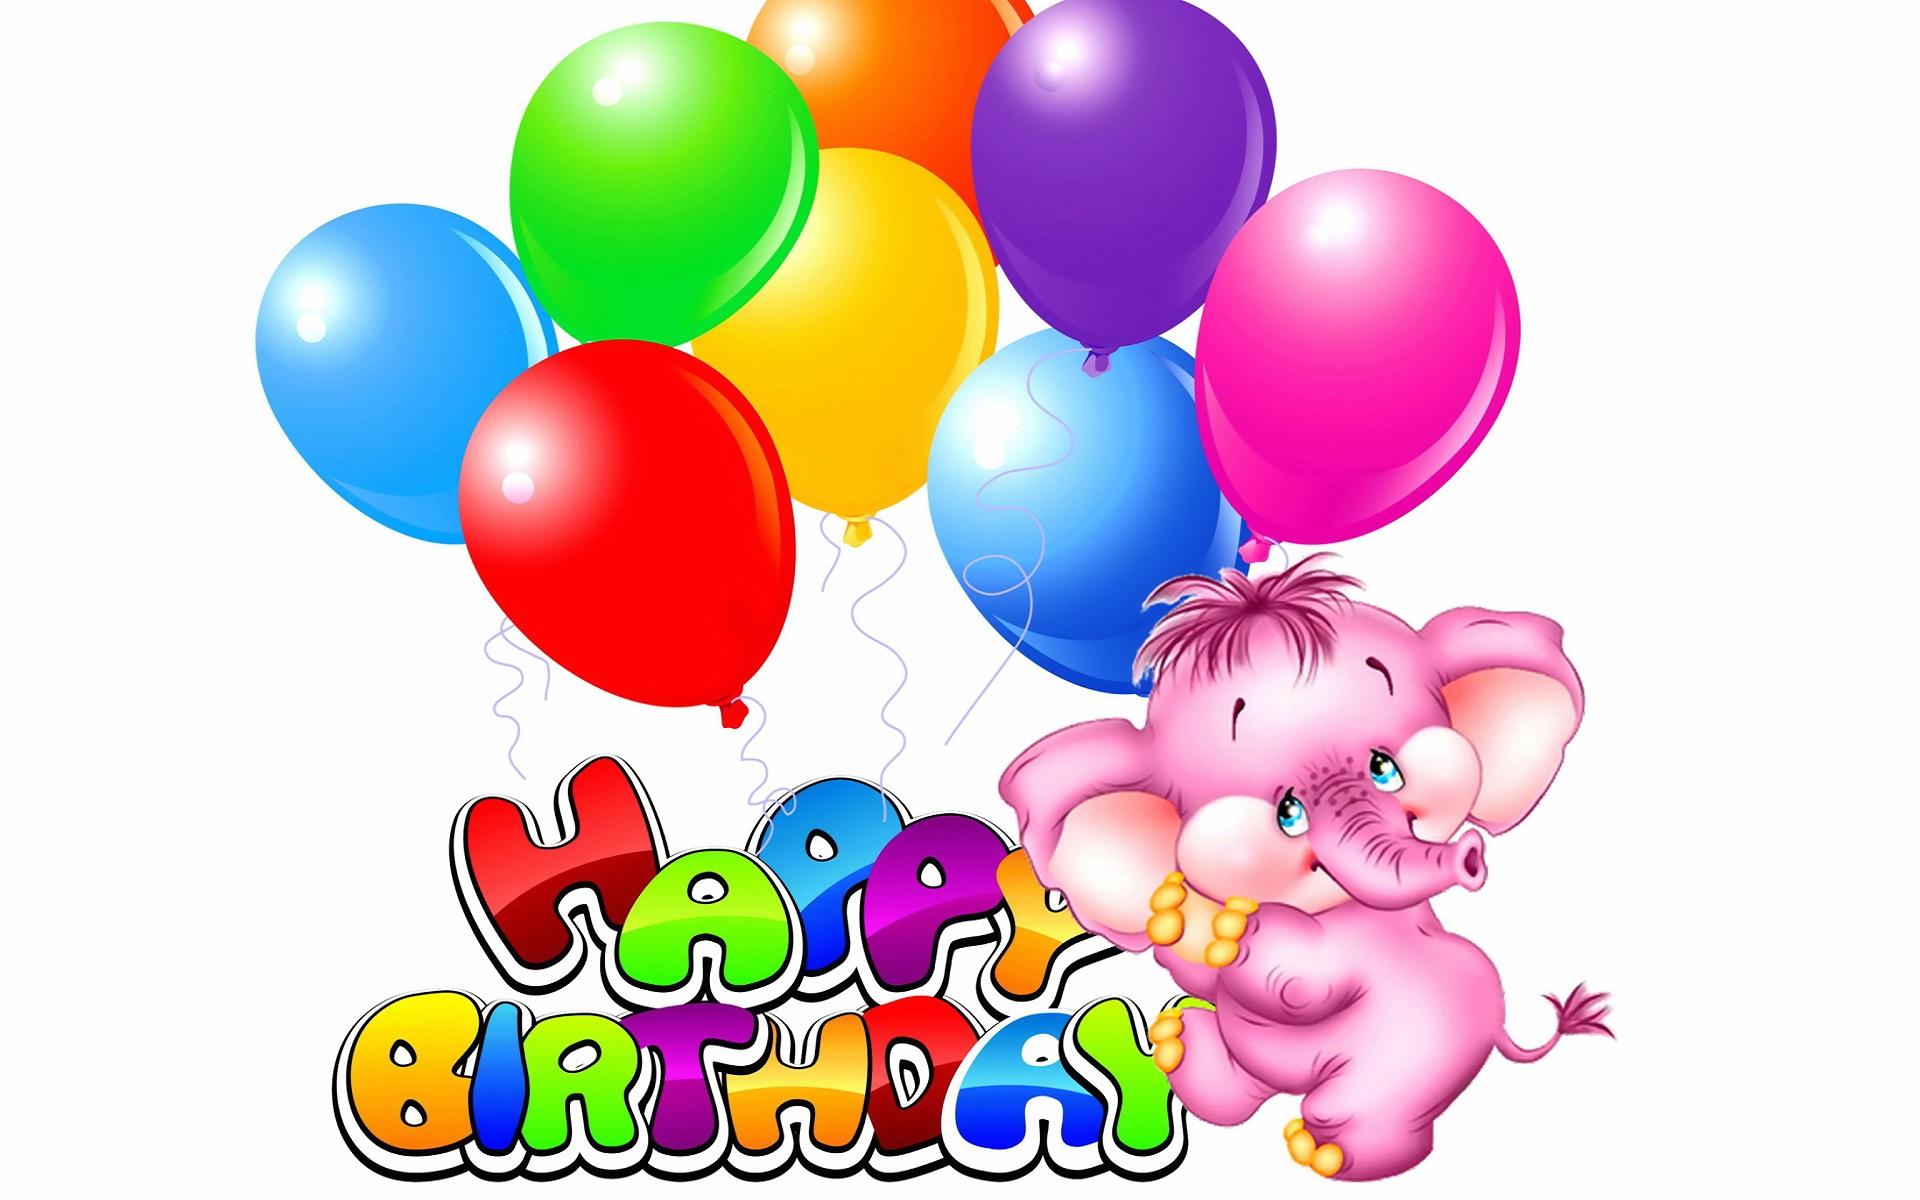 Happy birthday animated design HD Wallpapers Rocks 1920x1200